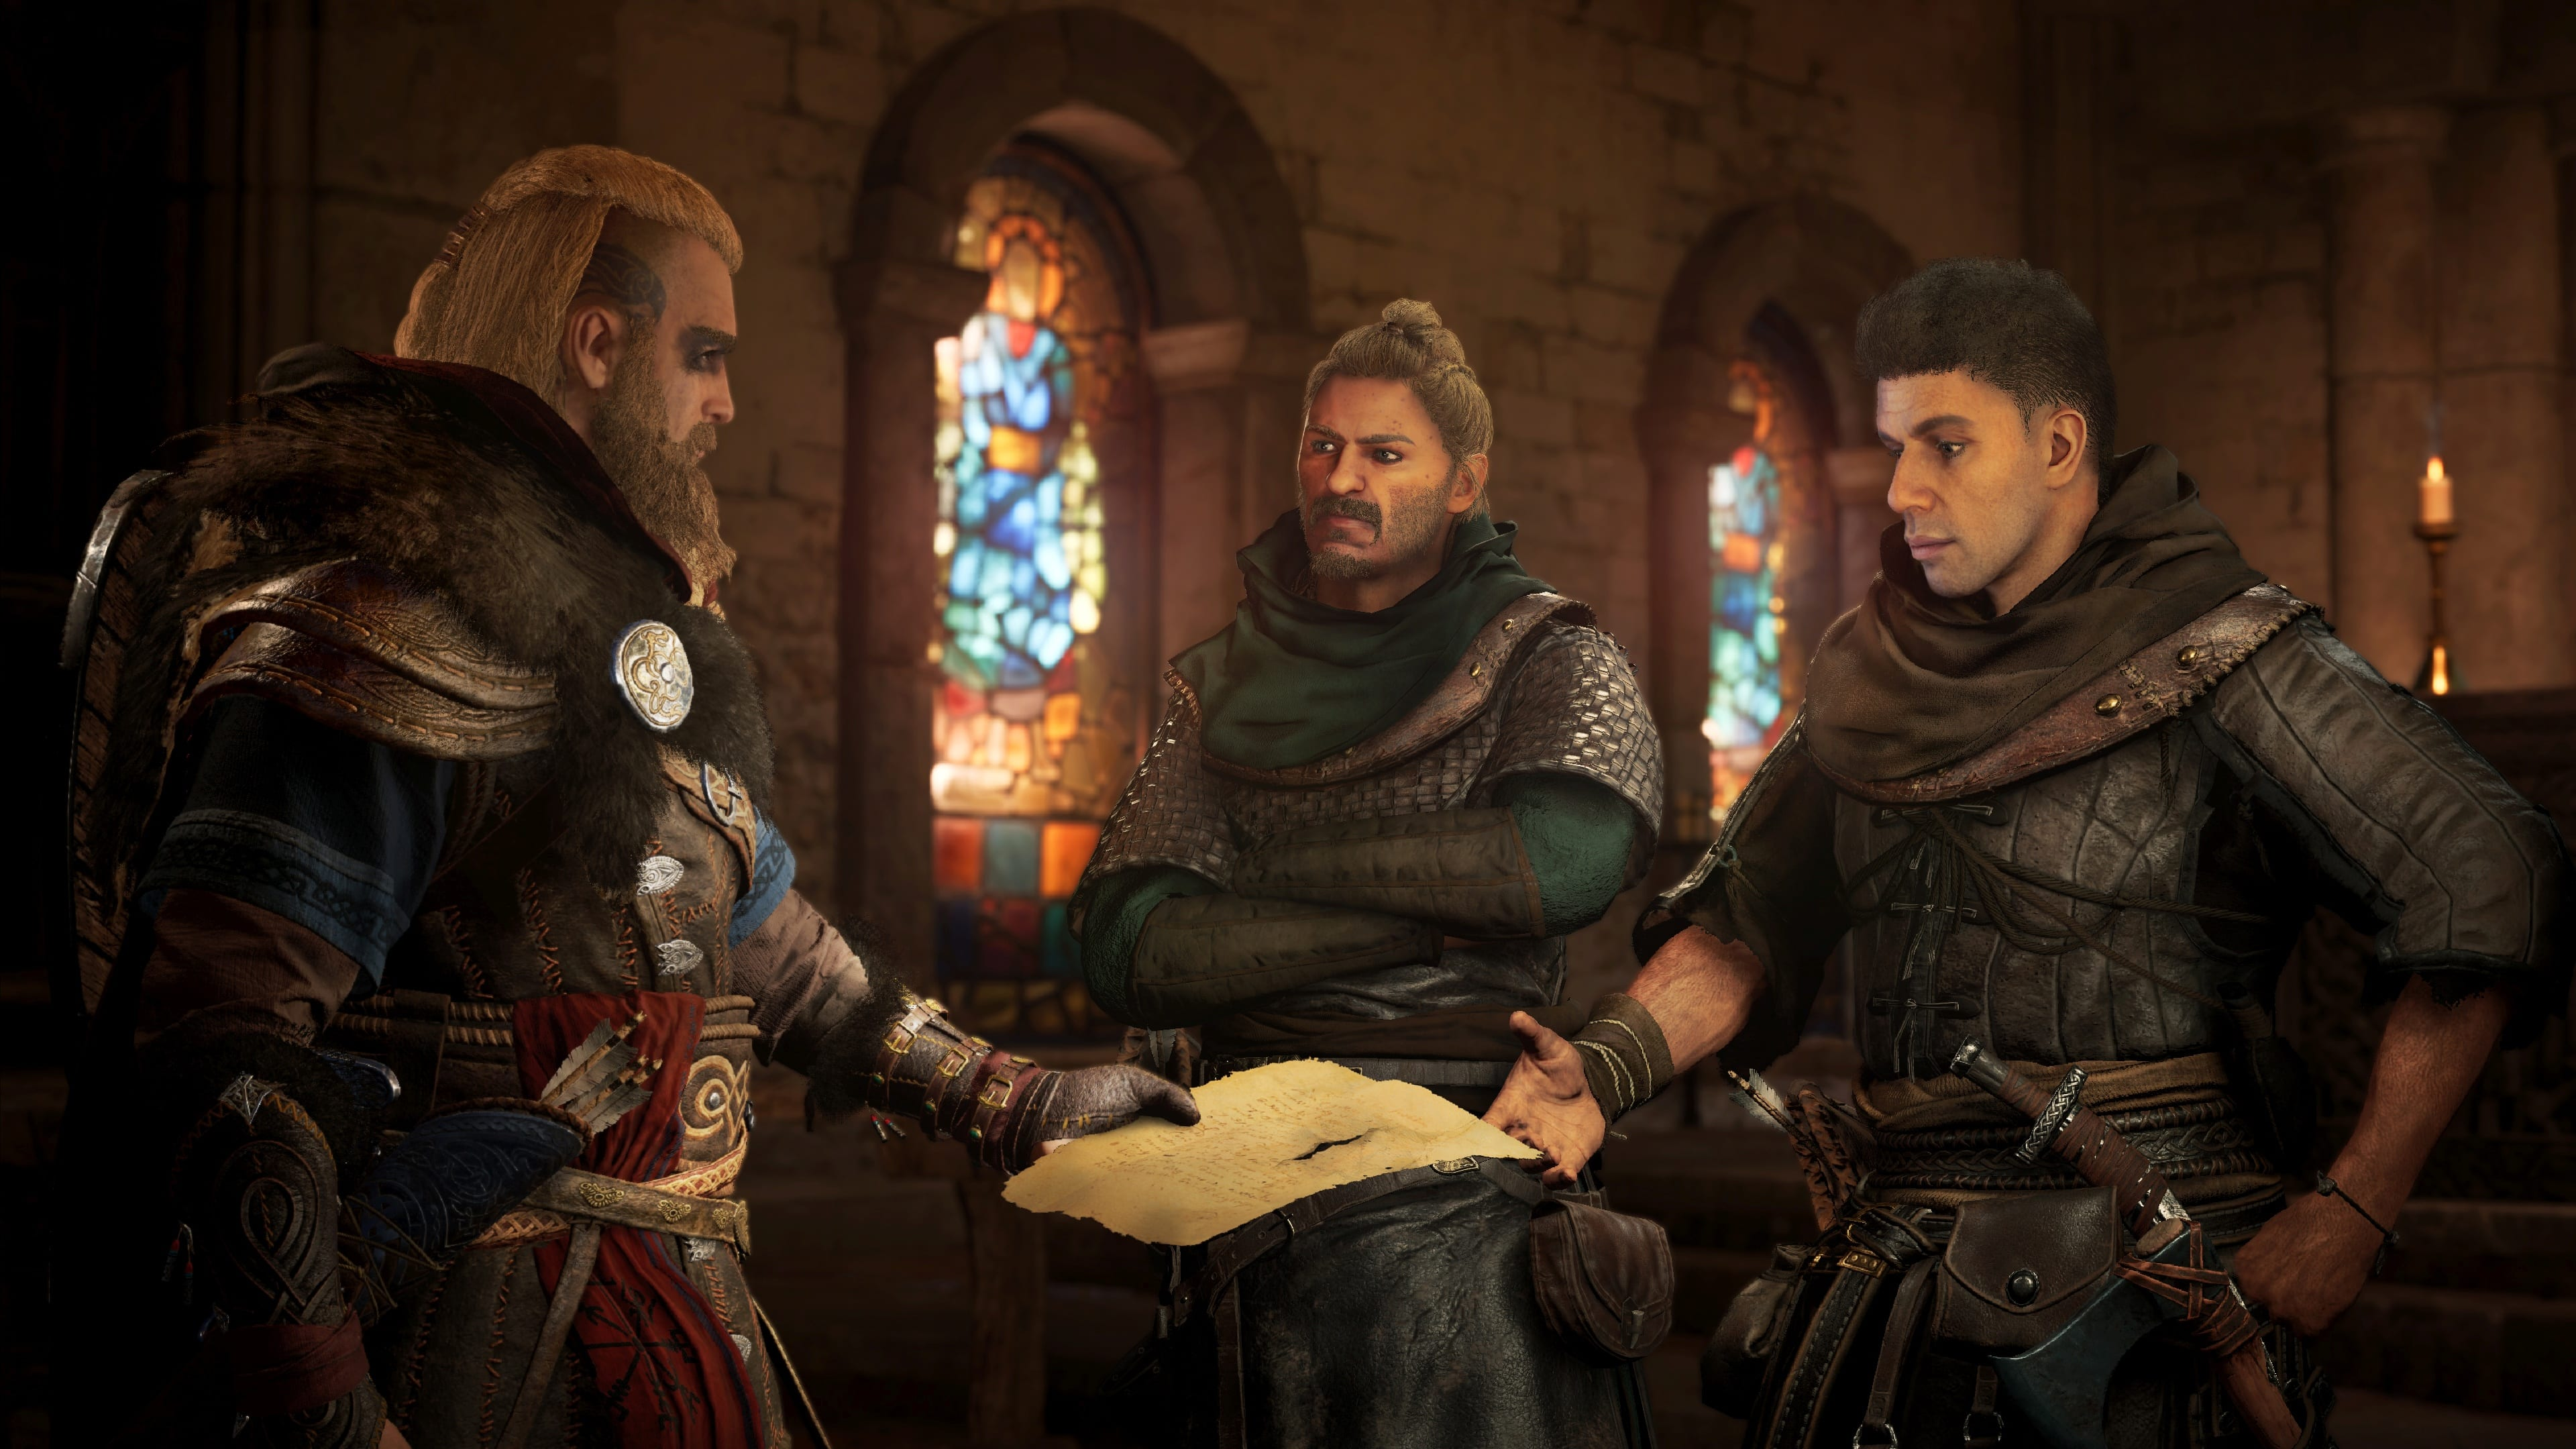 Assassin's Creed Valhalla Cutscene